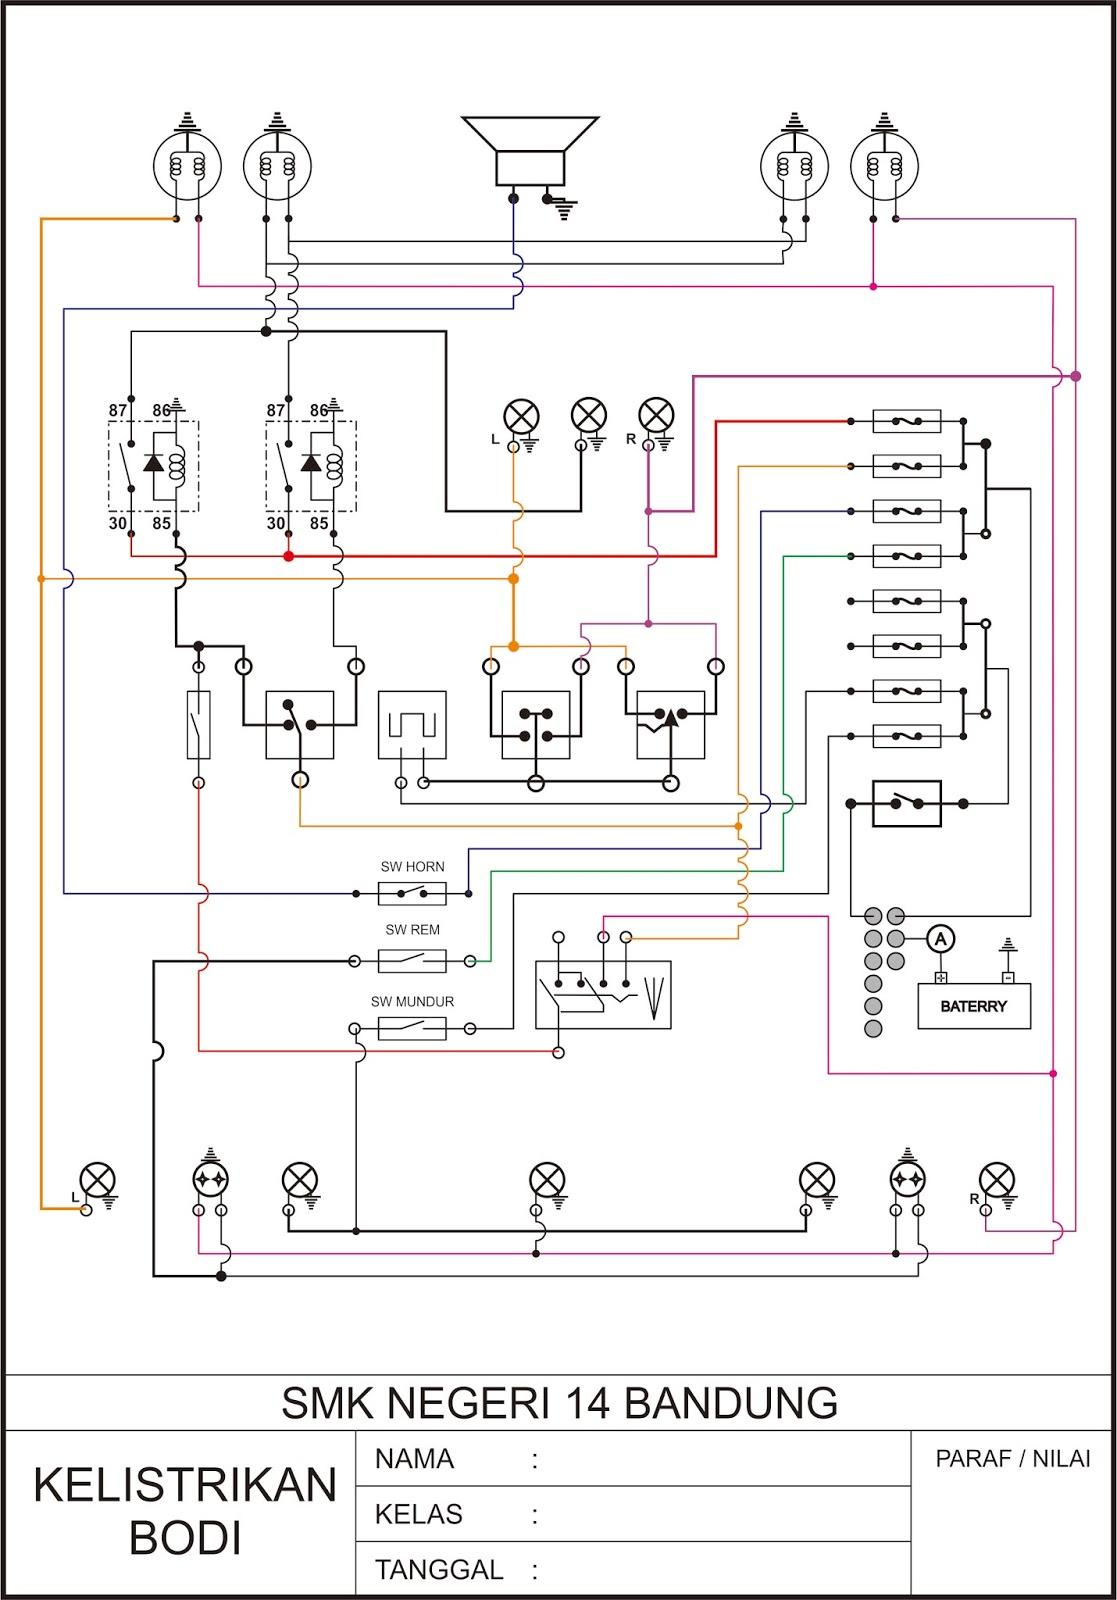 Tpbo smkn 14 bandung wiring diagram kelistrikan bodi wiring diagram kelistrikan bodi ccuart Gallery